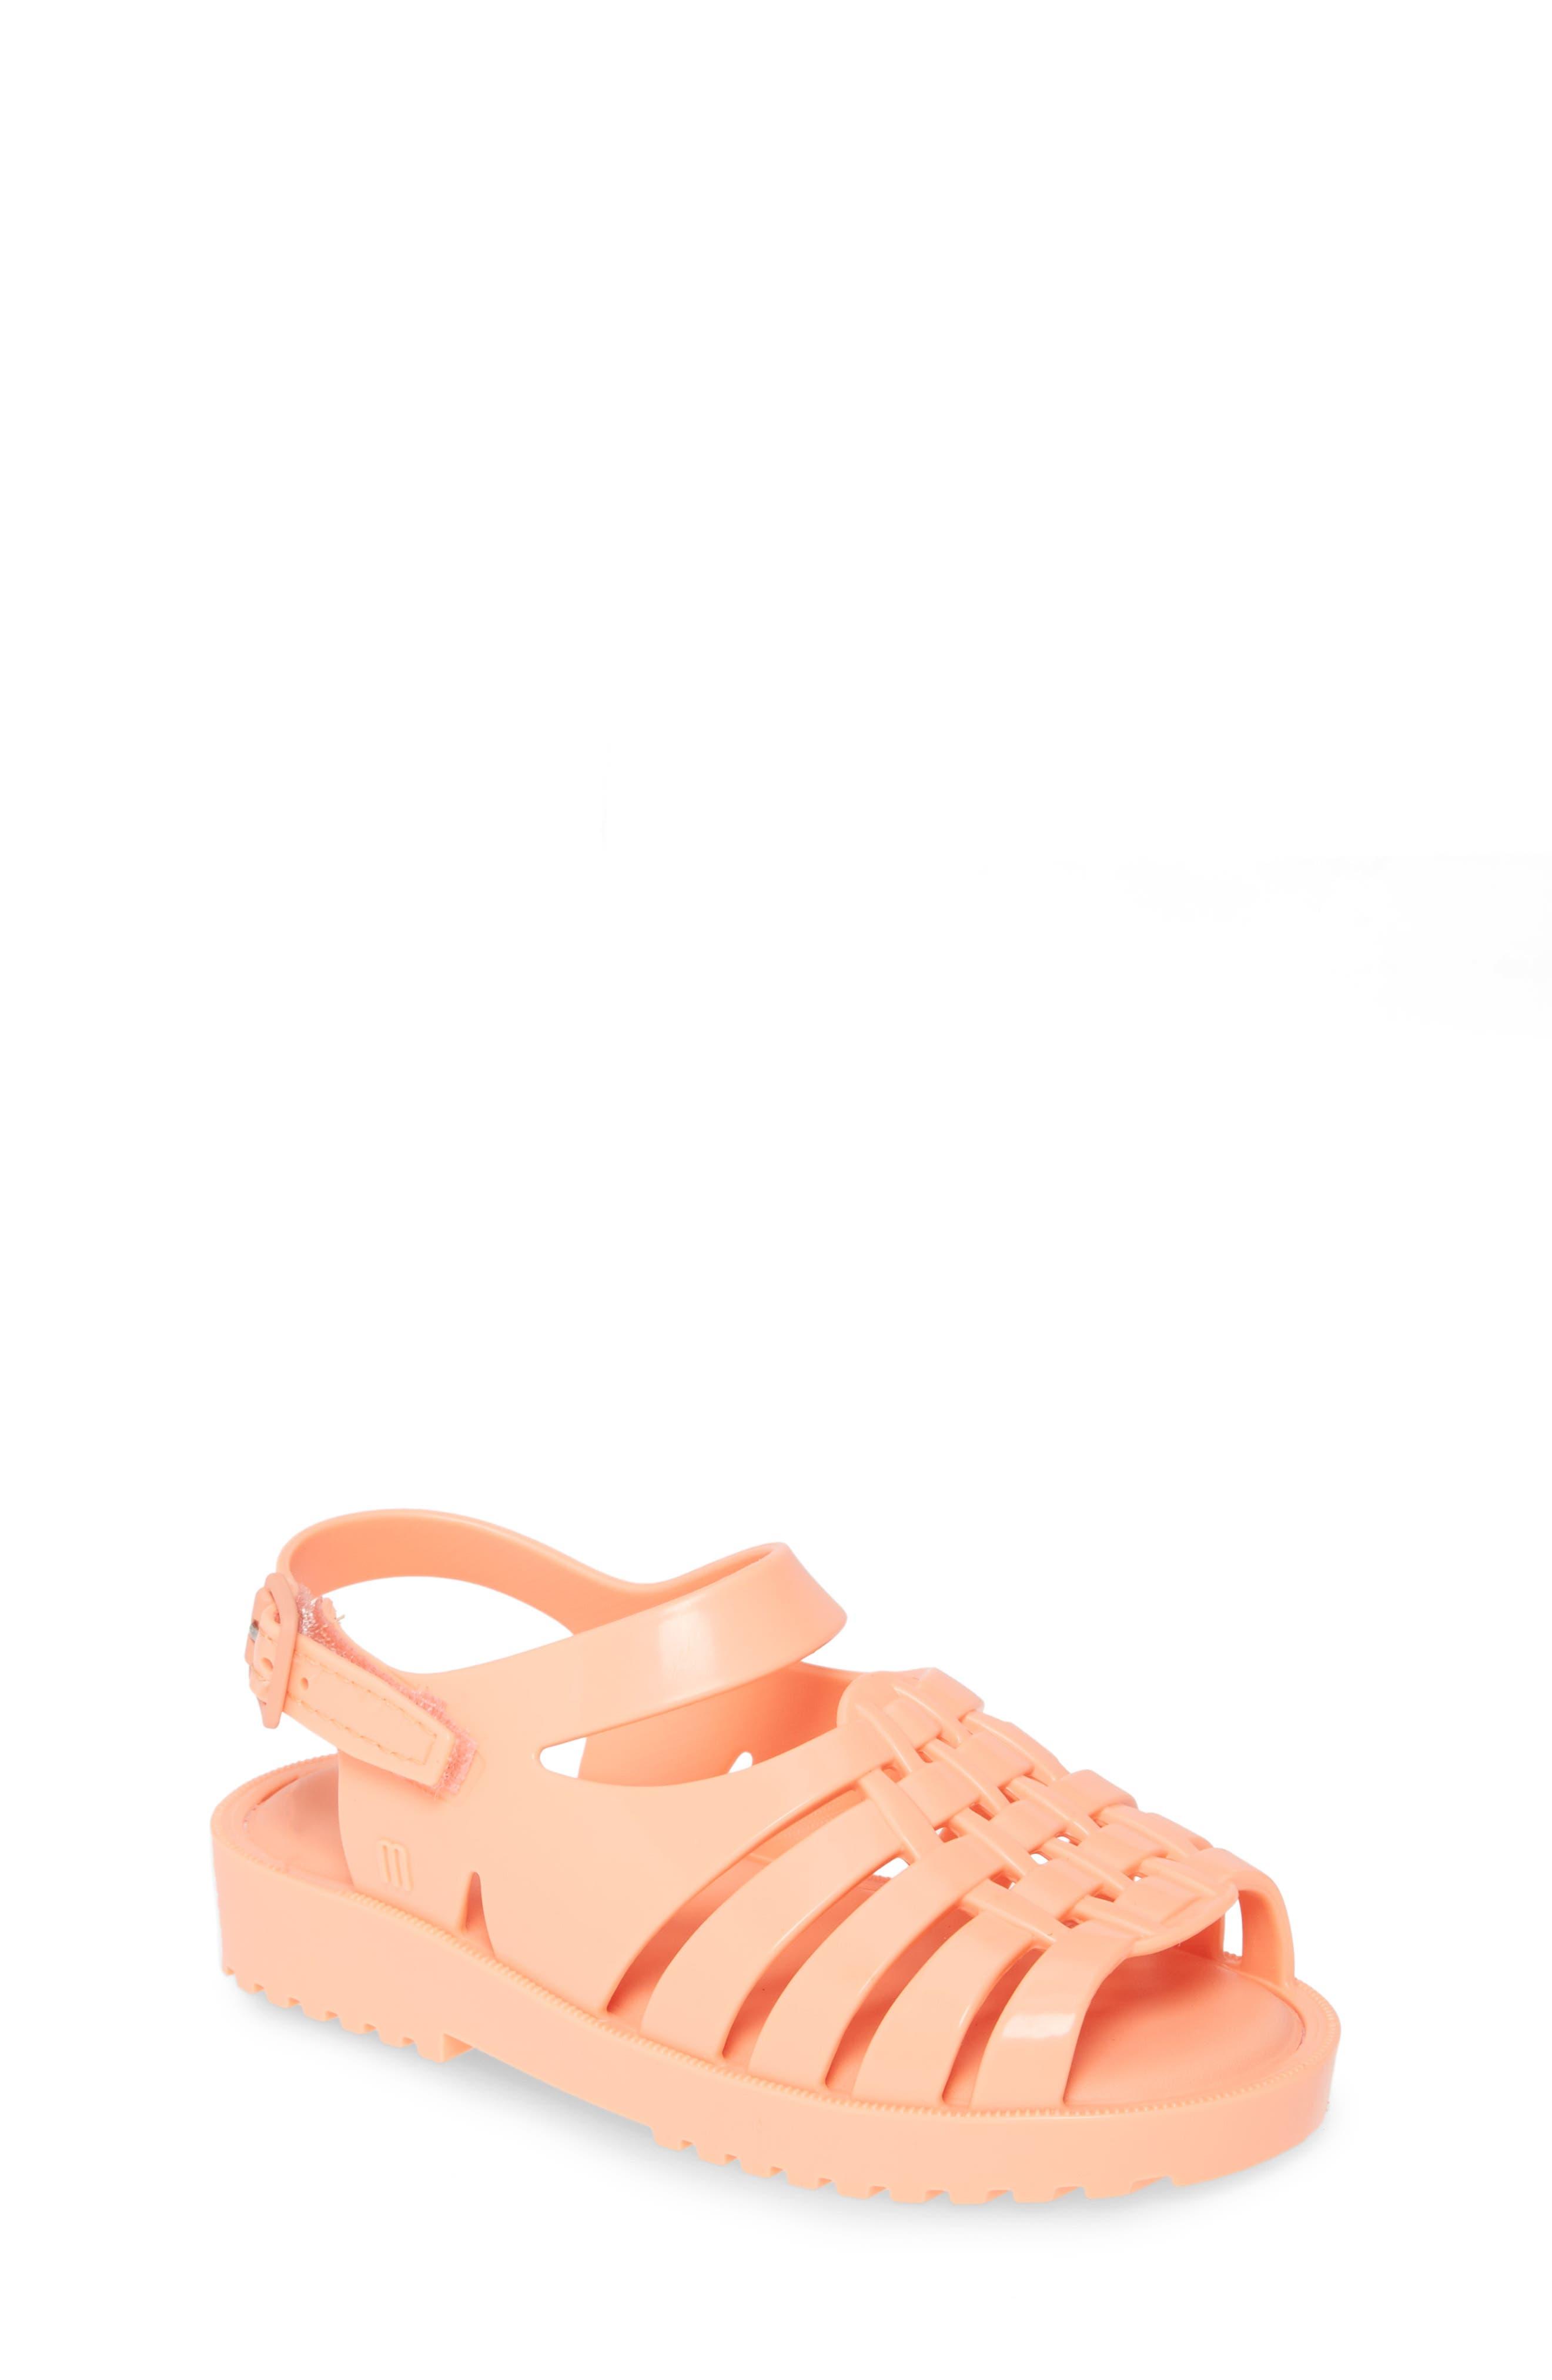 Toddler Girls Mini Melissa Frances Jelly Sandal Size 8 M  Pink